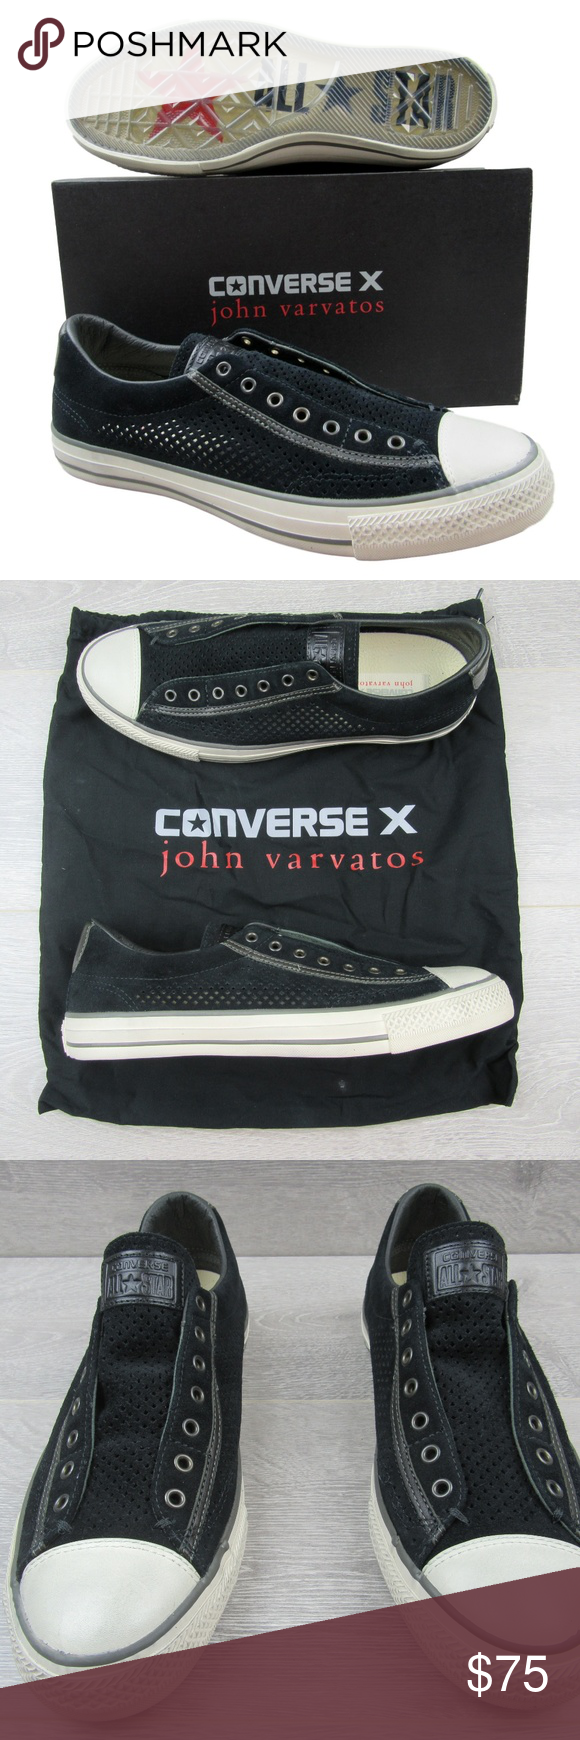 converse john varvatos price